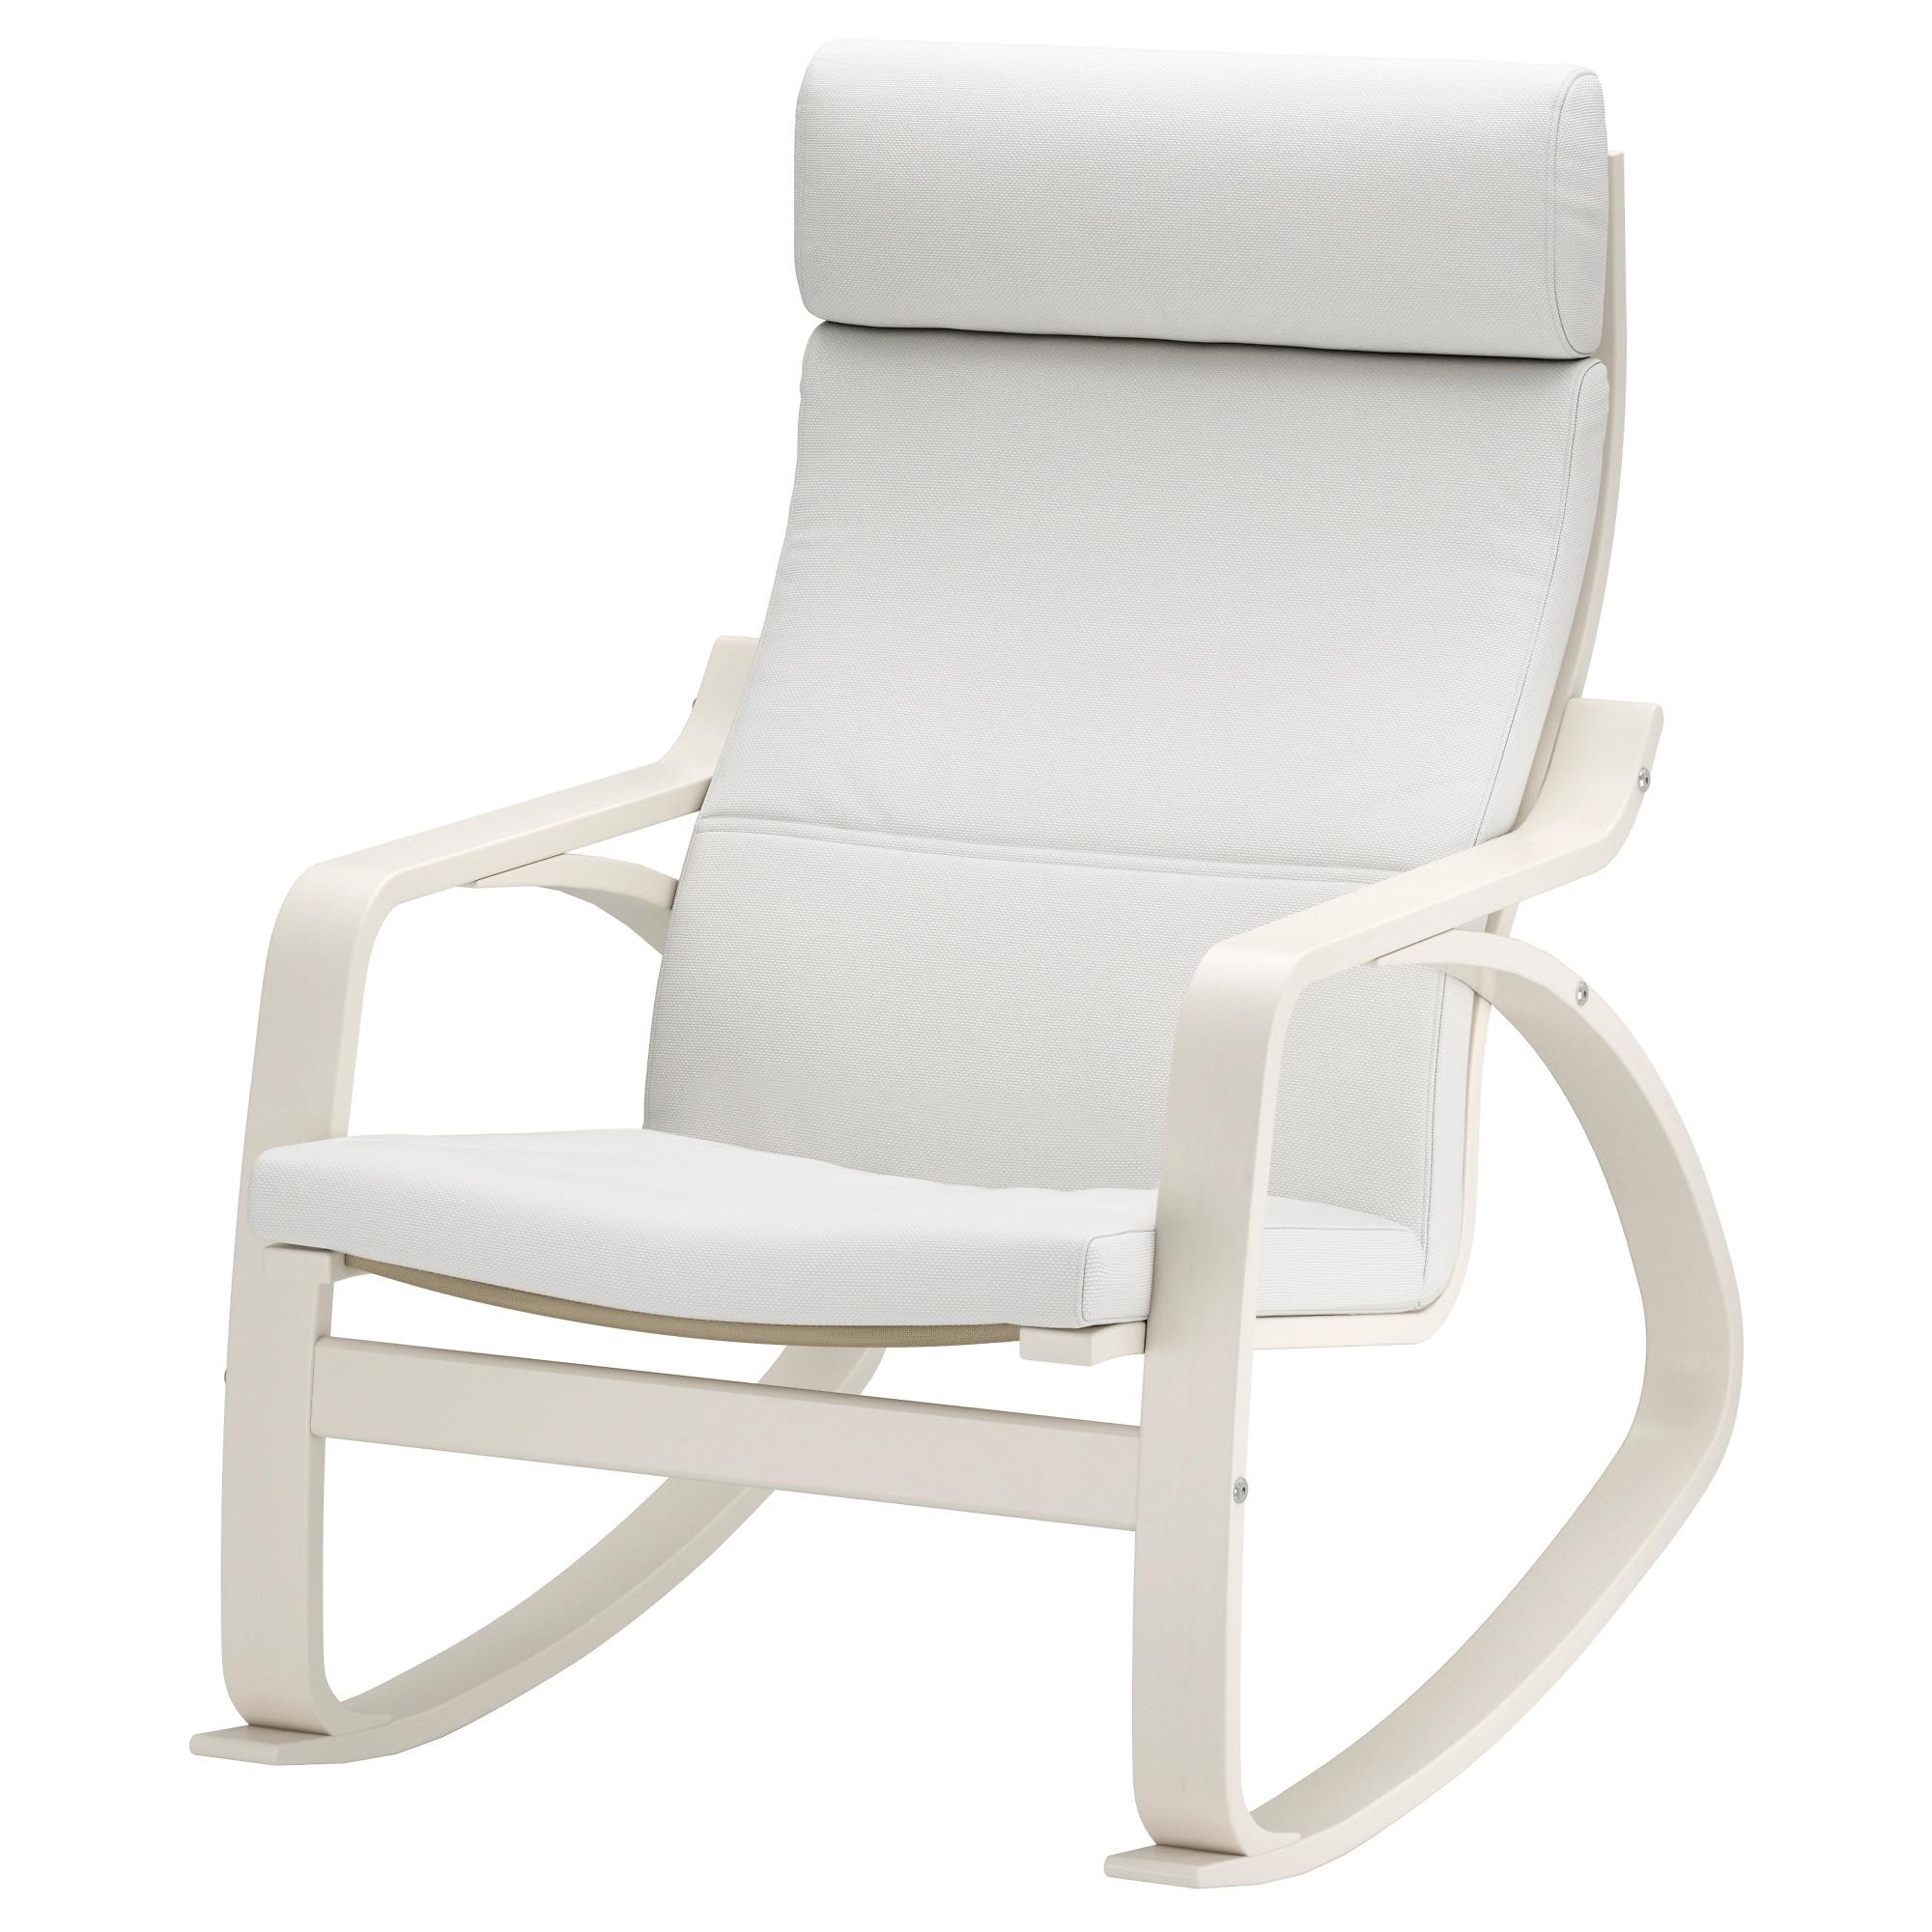 Chair | Rocking Chair Parts Modern Glider Rocker White Rocking Chair With Regard To Rocking Chairs At Ikea (#3 of 15)